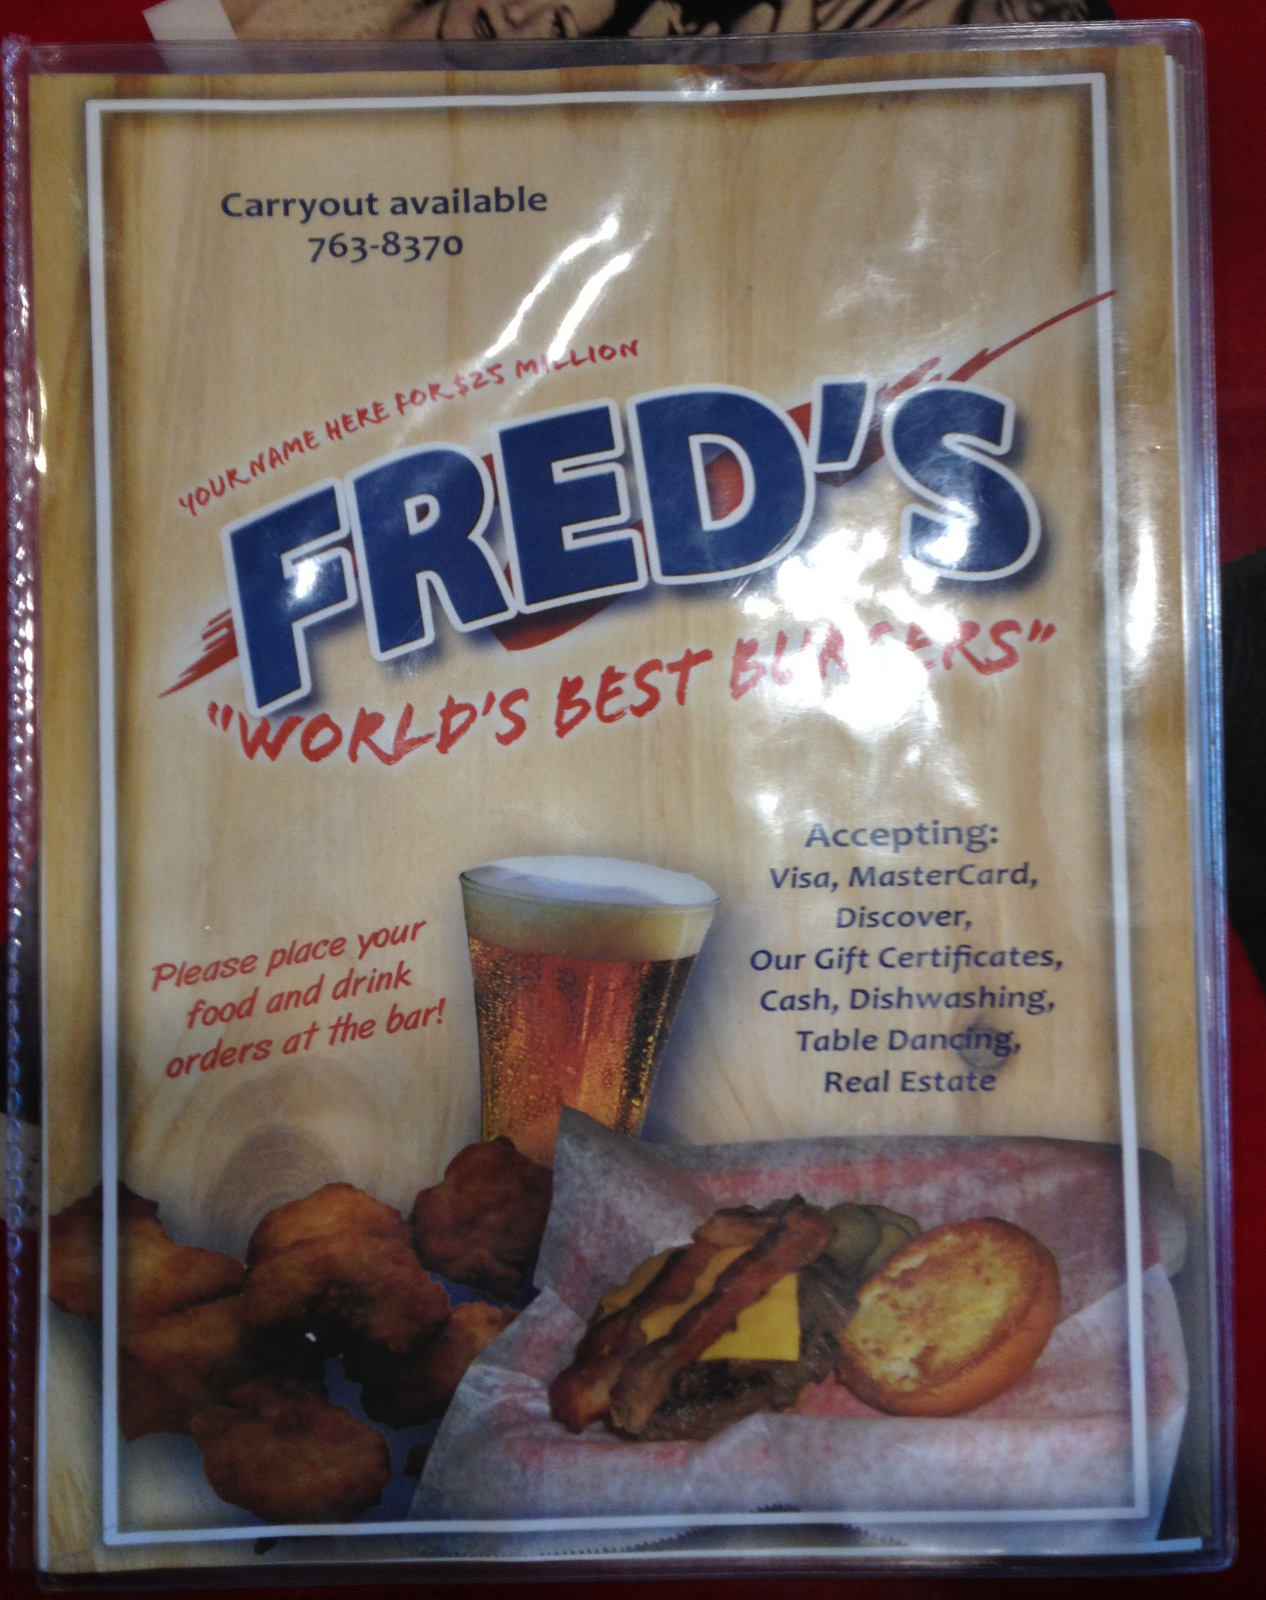 Fred's in Burlington